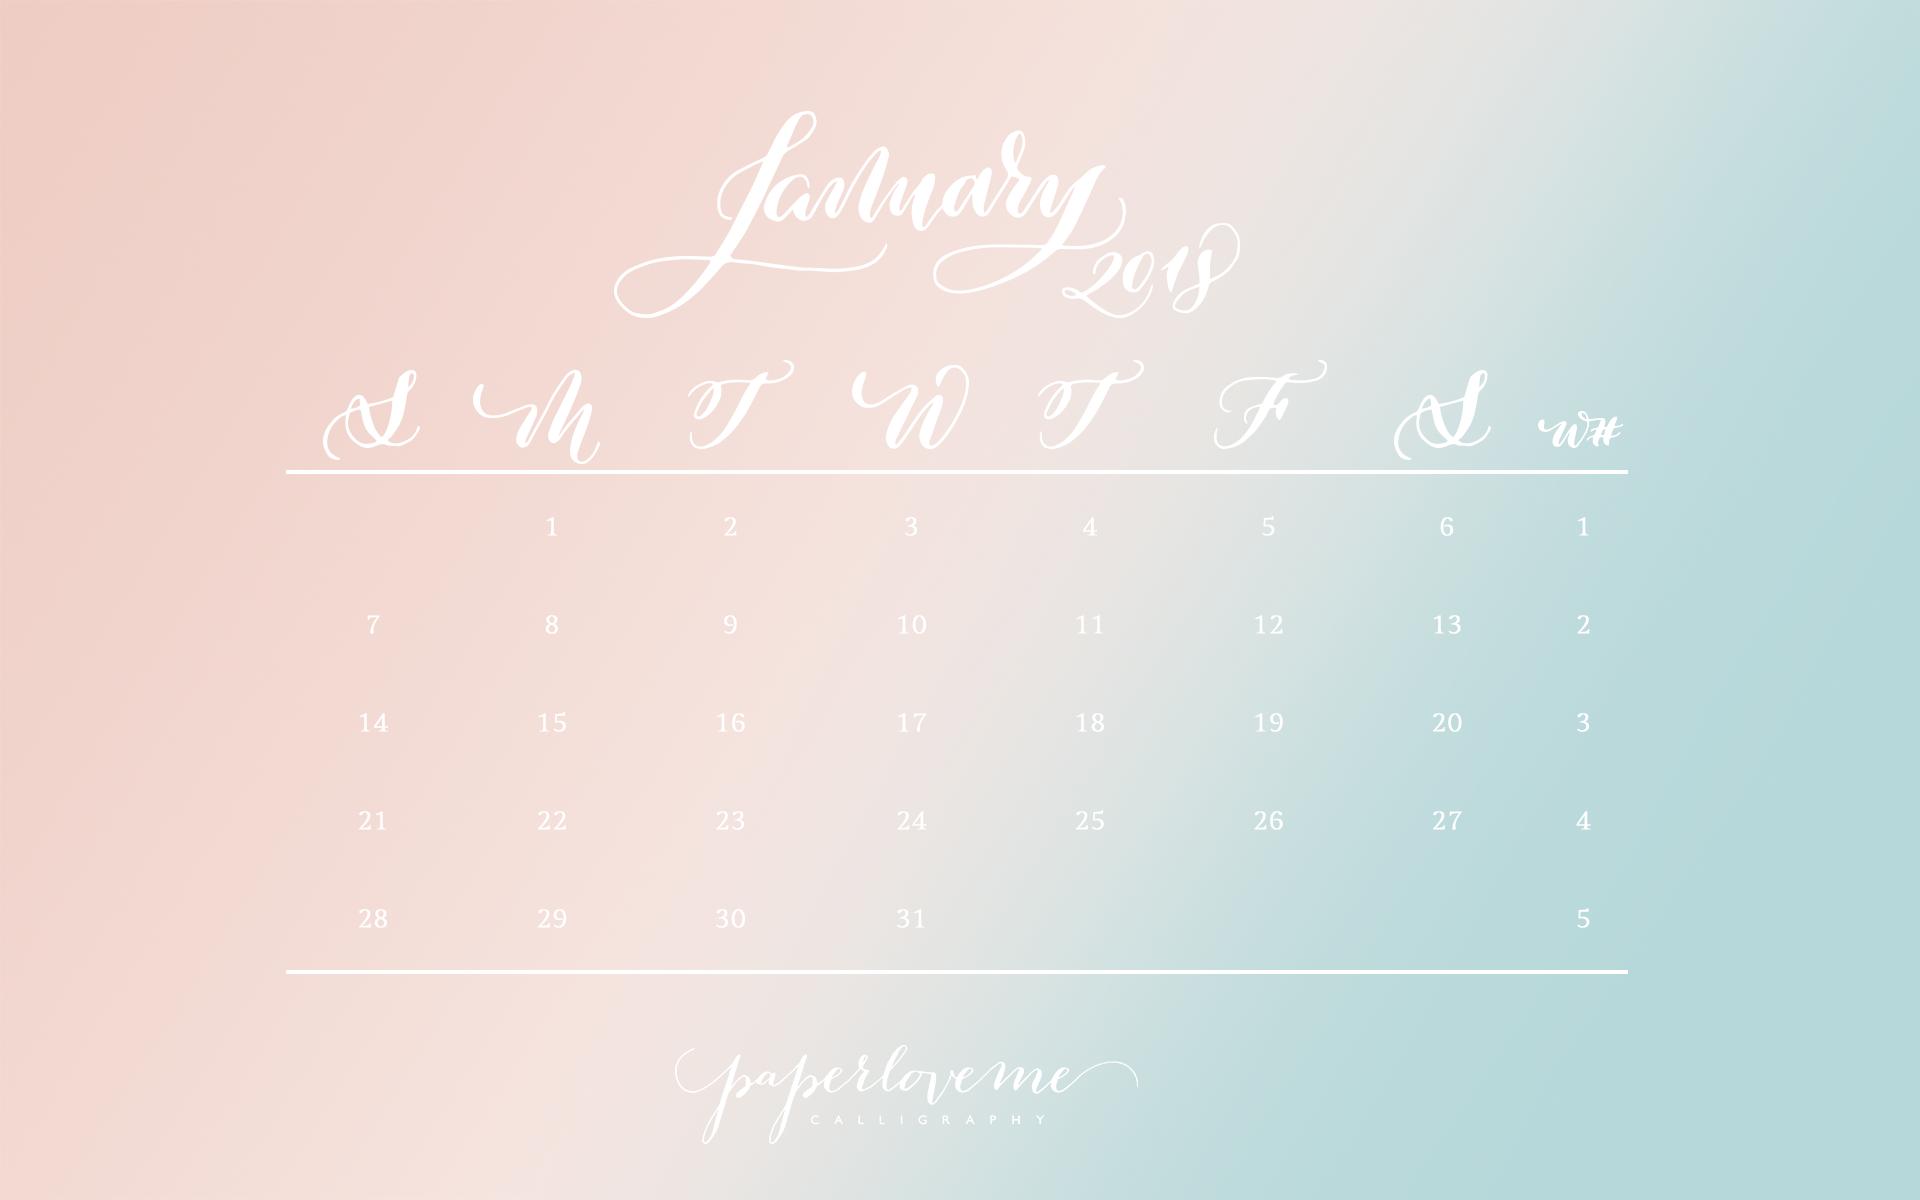 free january 2018 calendar download